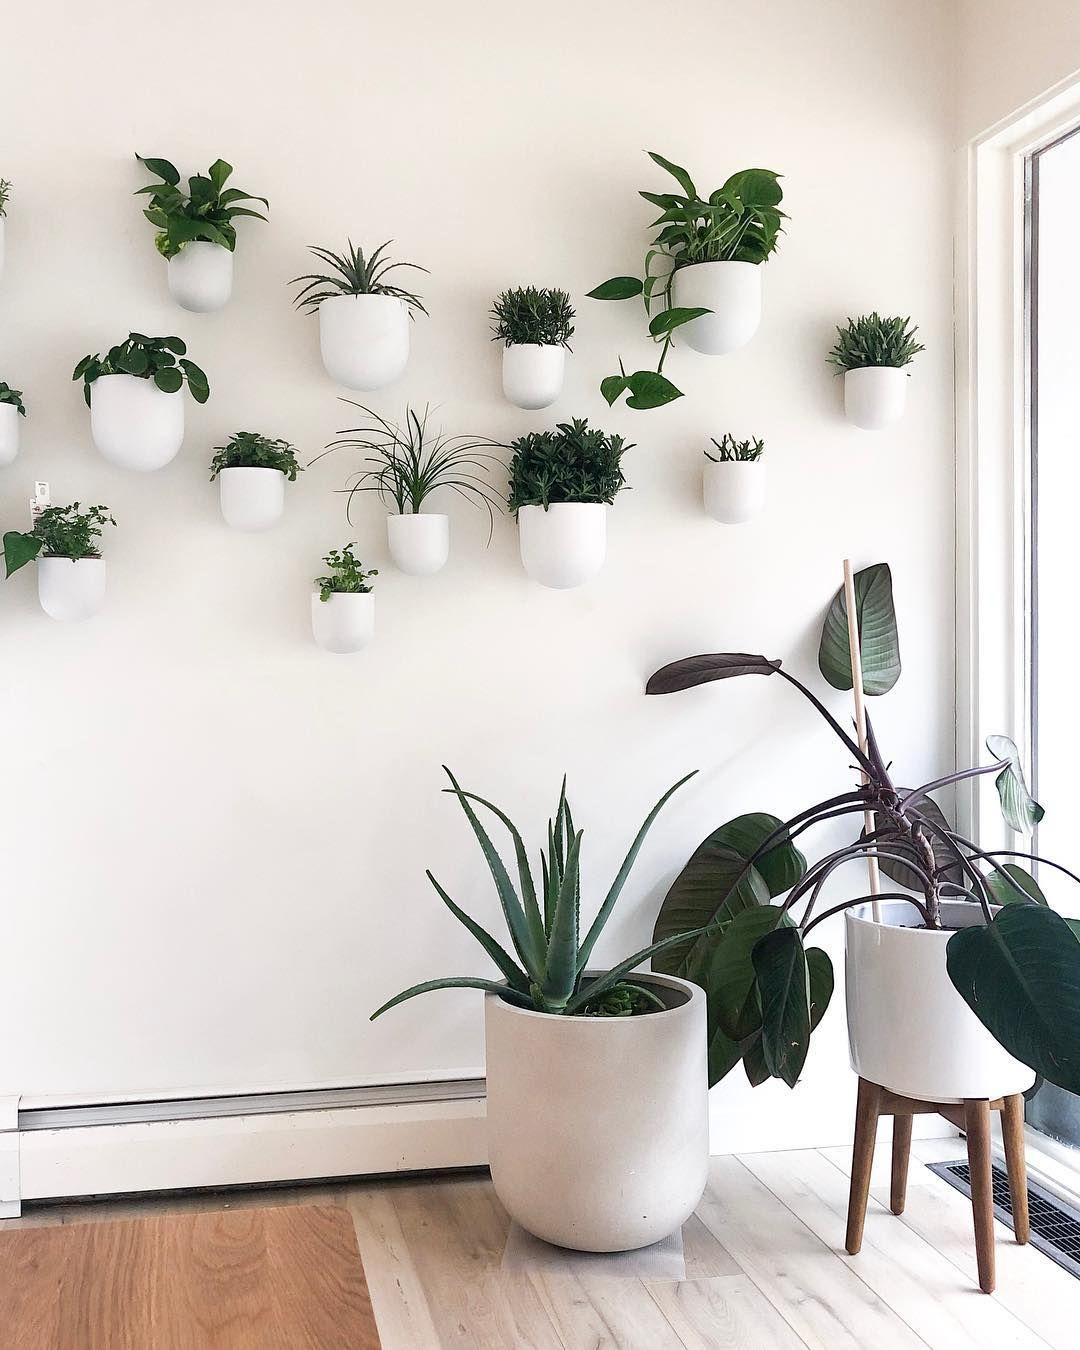 Houseplants Indoor Plants Plants Decor Home Decor Interior Style Plant Corner Nordic Style Scandinavian L Plant Wall Decor Plant Decor Indoor Indoor Plant Wall